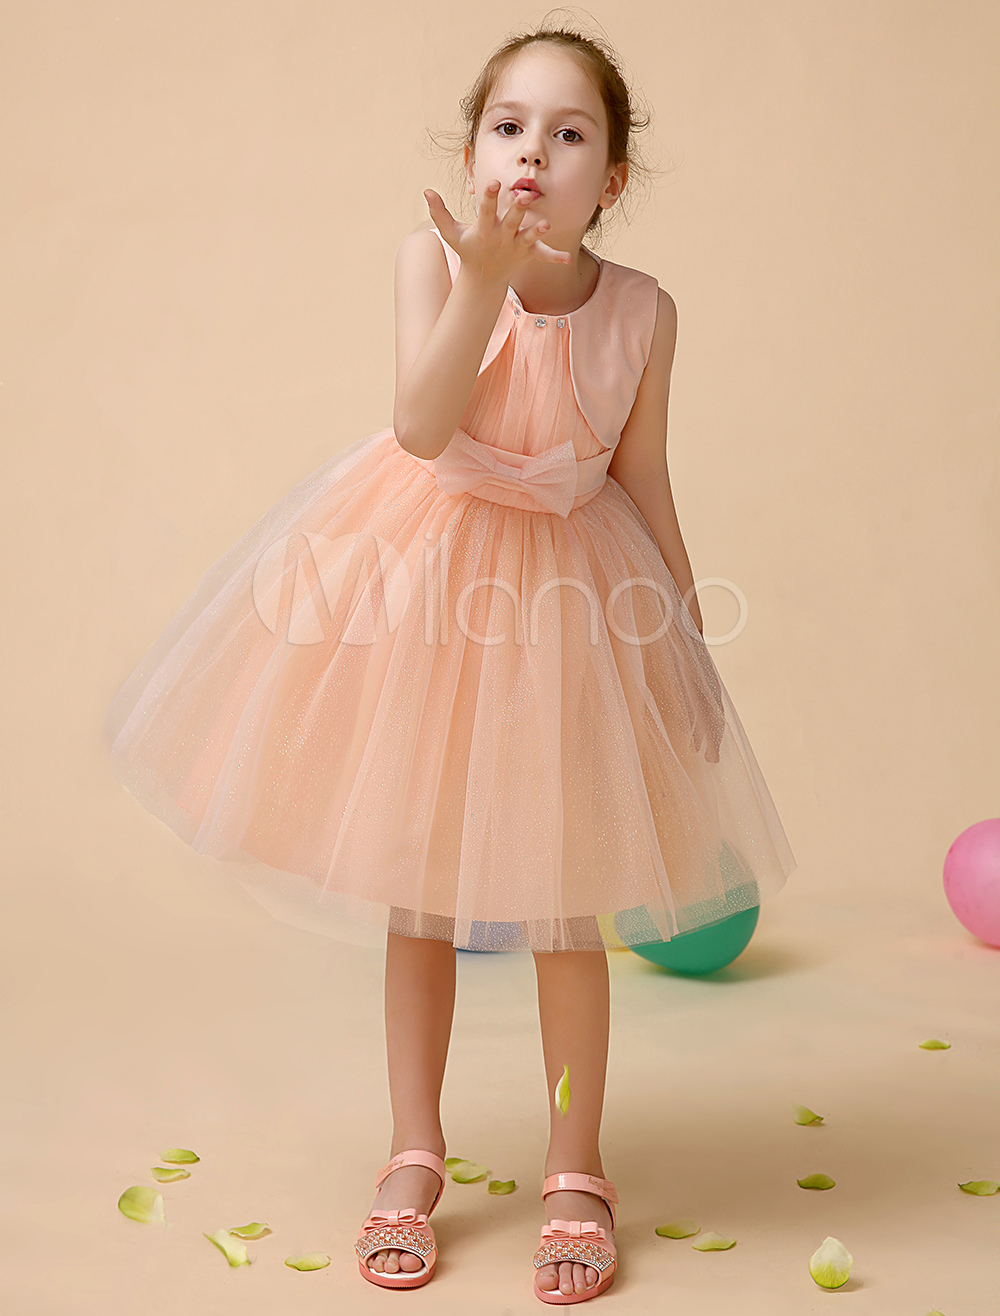 flower girl dresses short tutu dress toddlers tulle sleeveless satin ribbon bow sash rhinestones. Black Bedroom Furniture Sets. Home Design Ideas